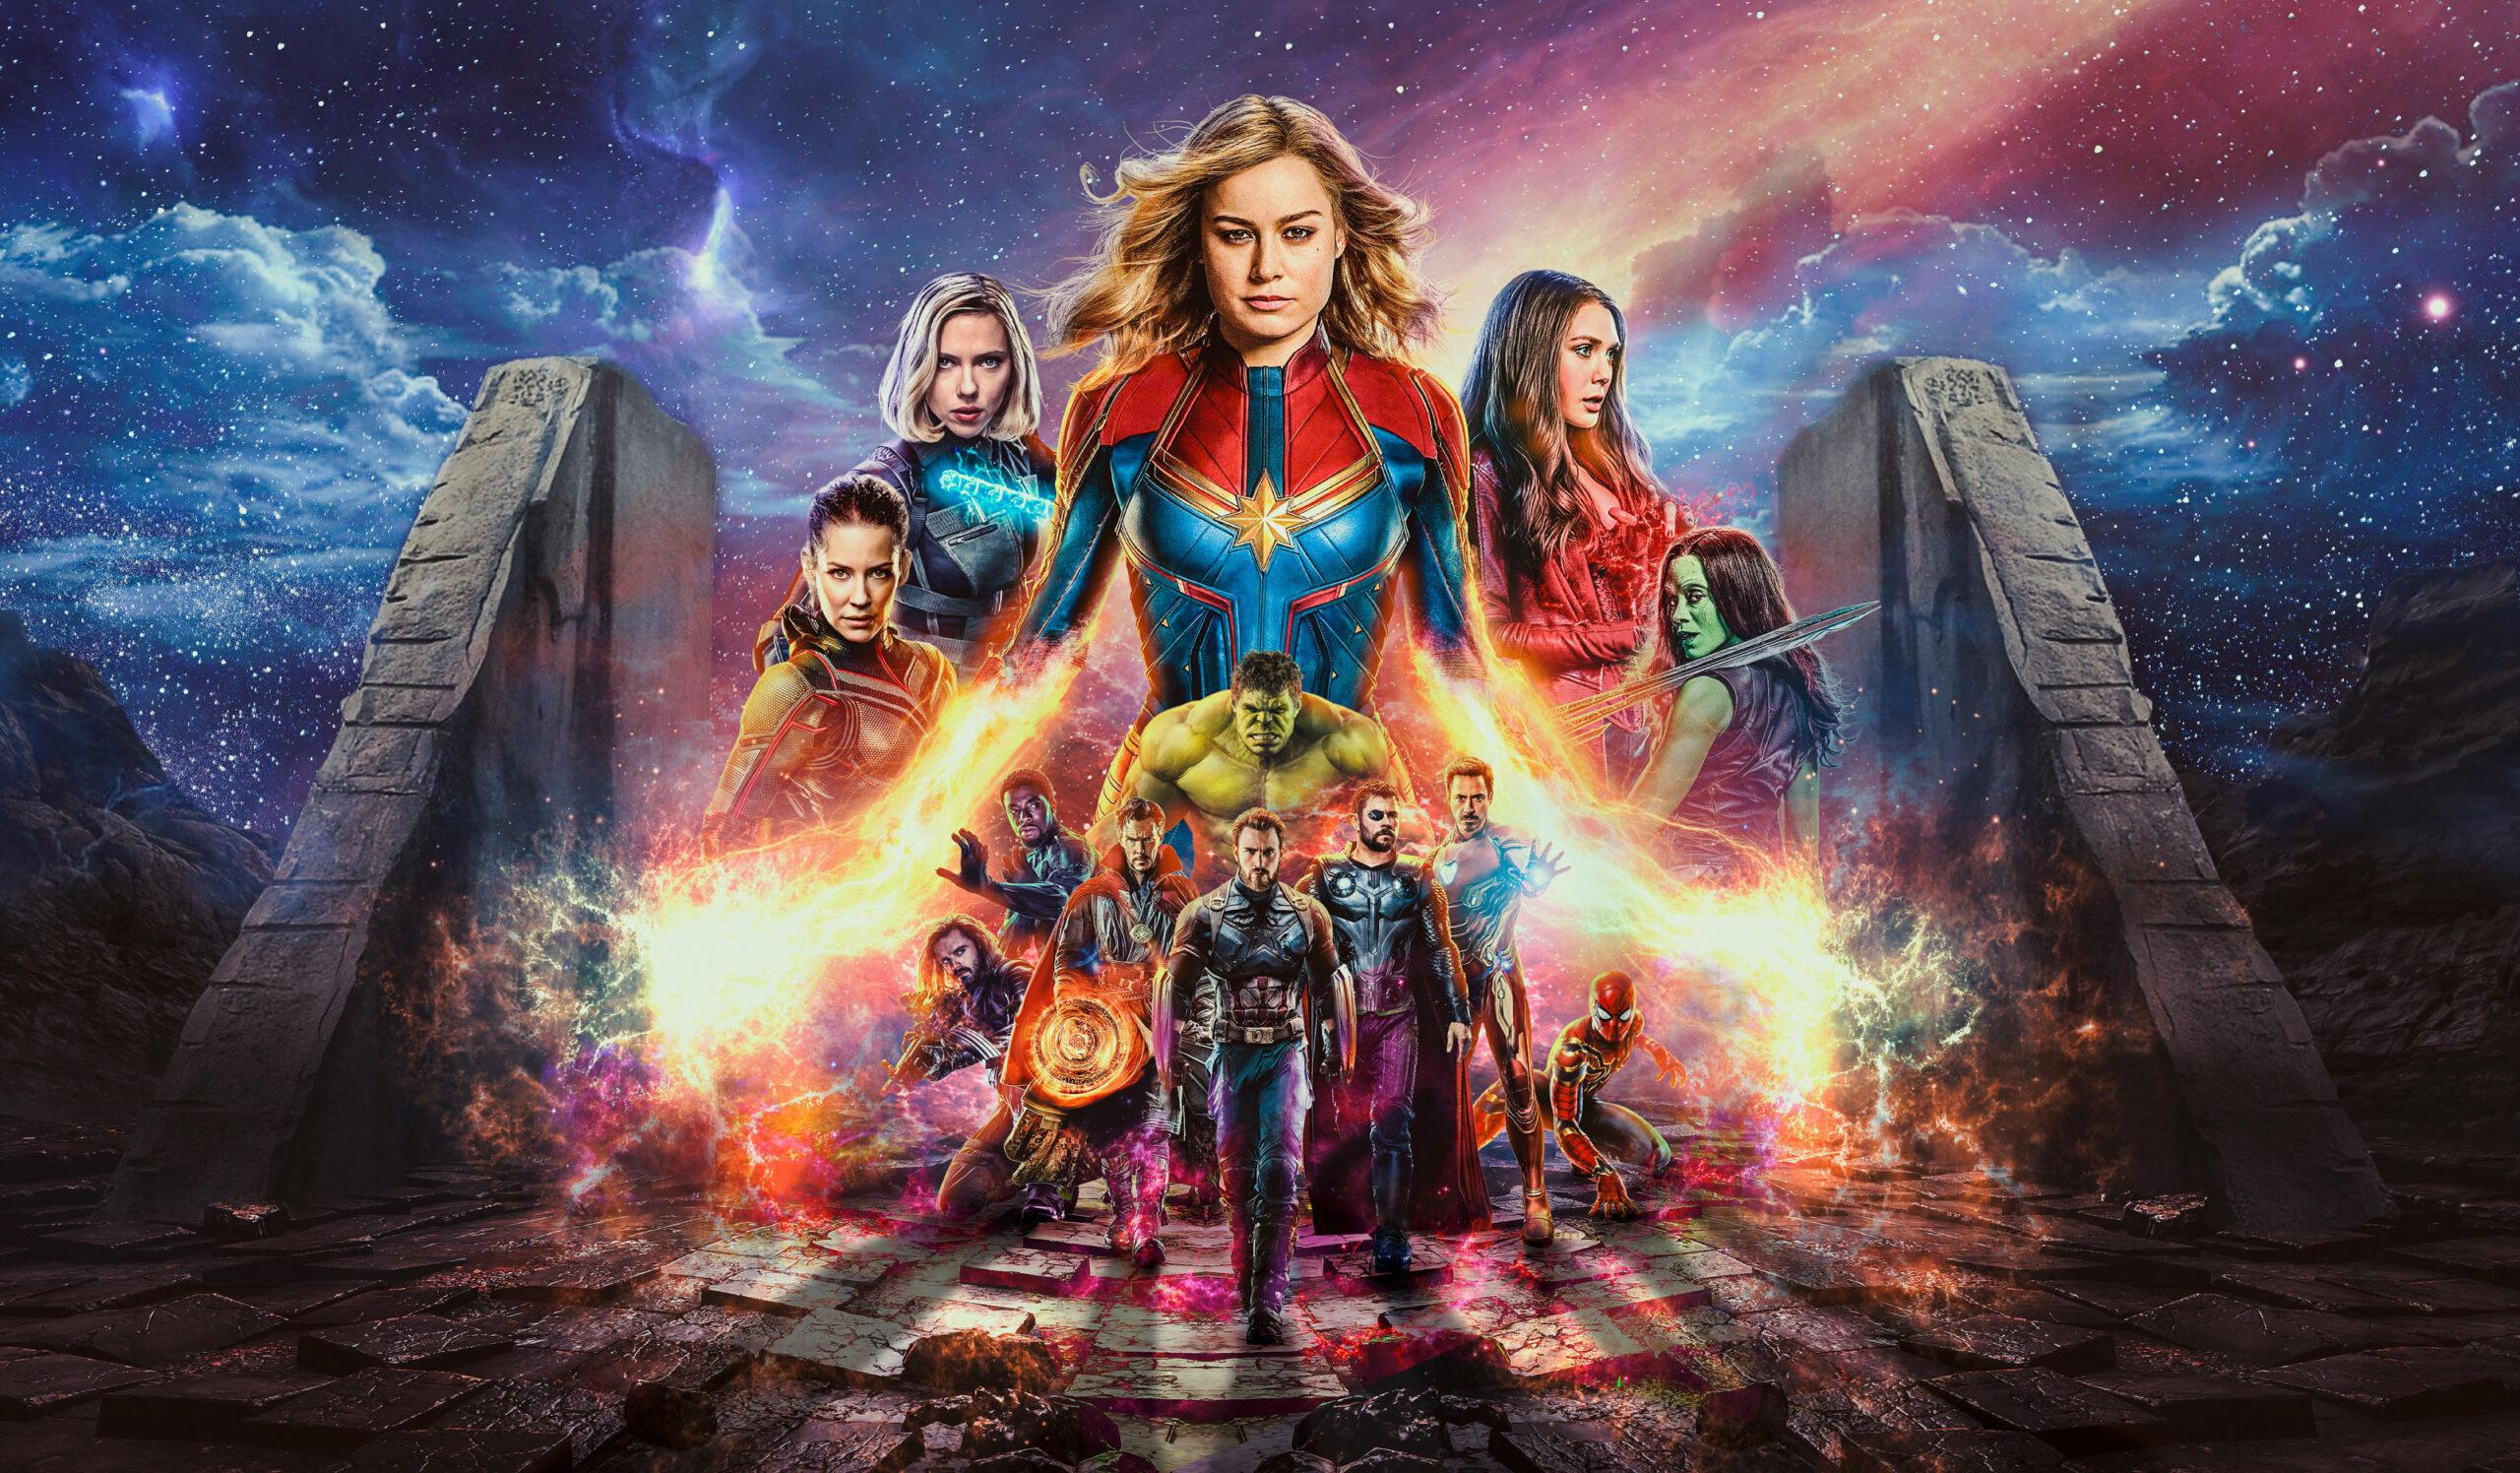 Avengers 4 Endgame 4K Wallpapers Download (Mobile & PC 2019)